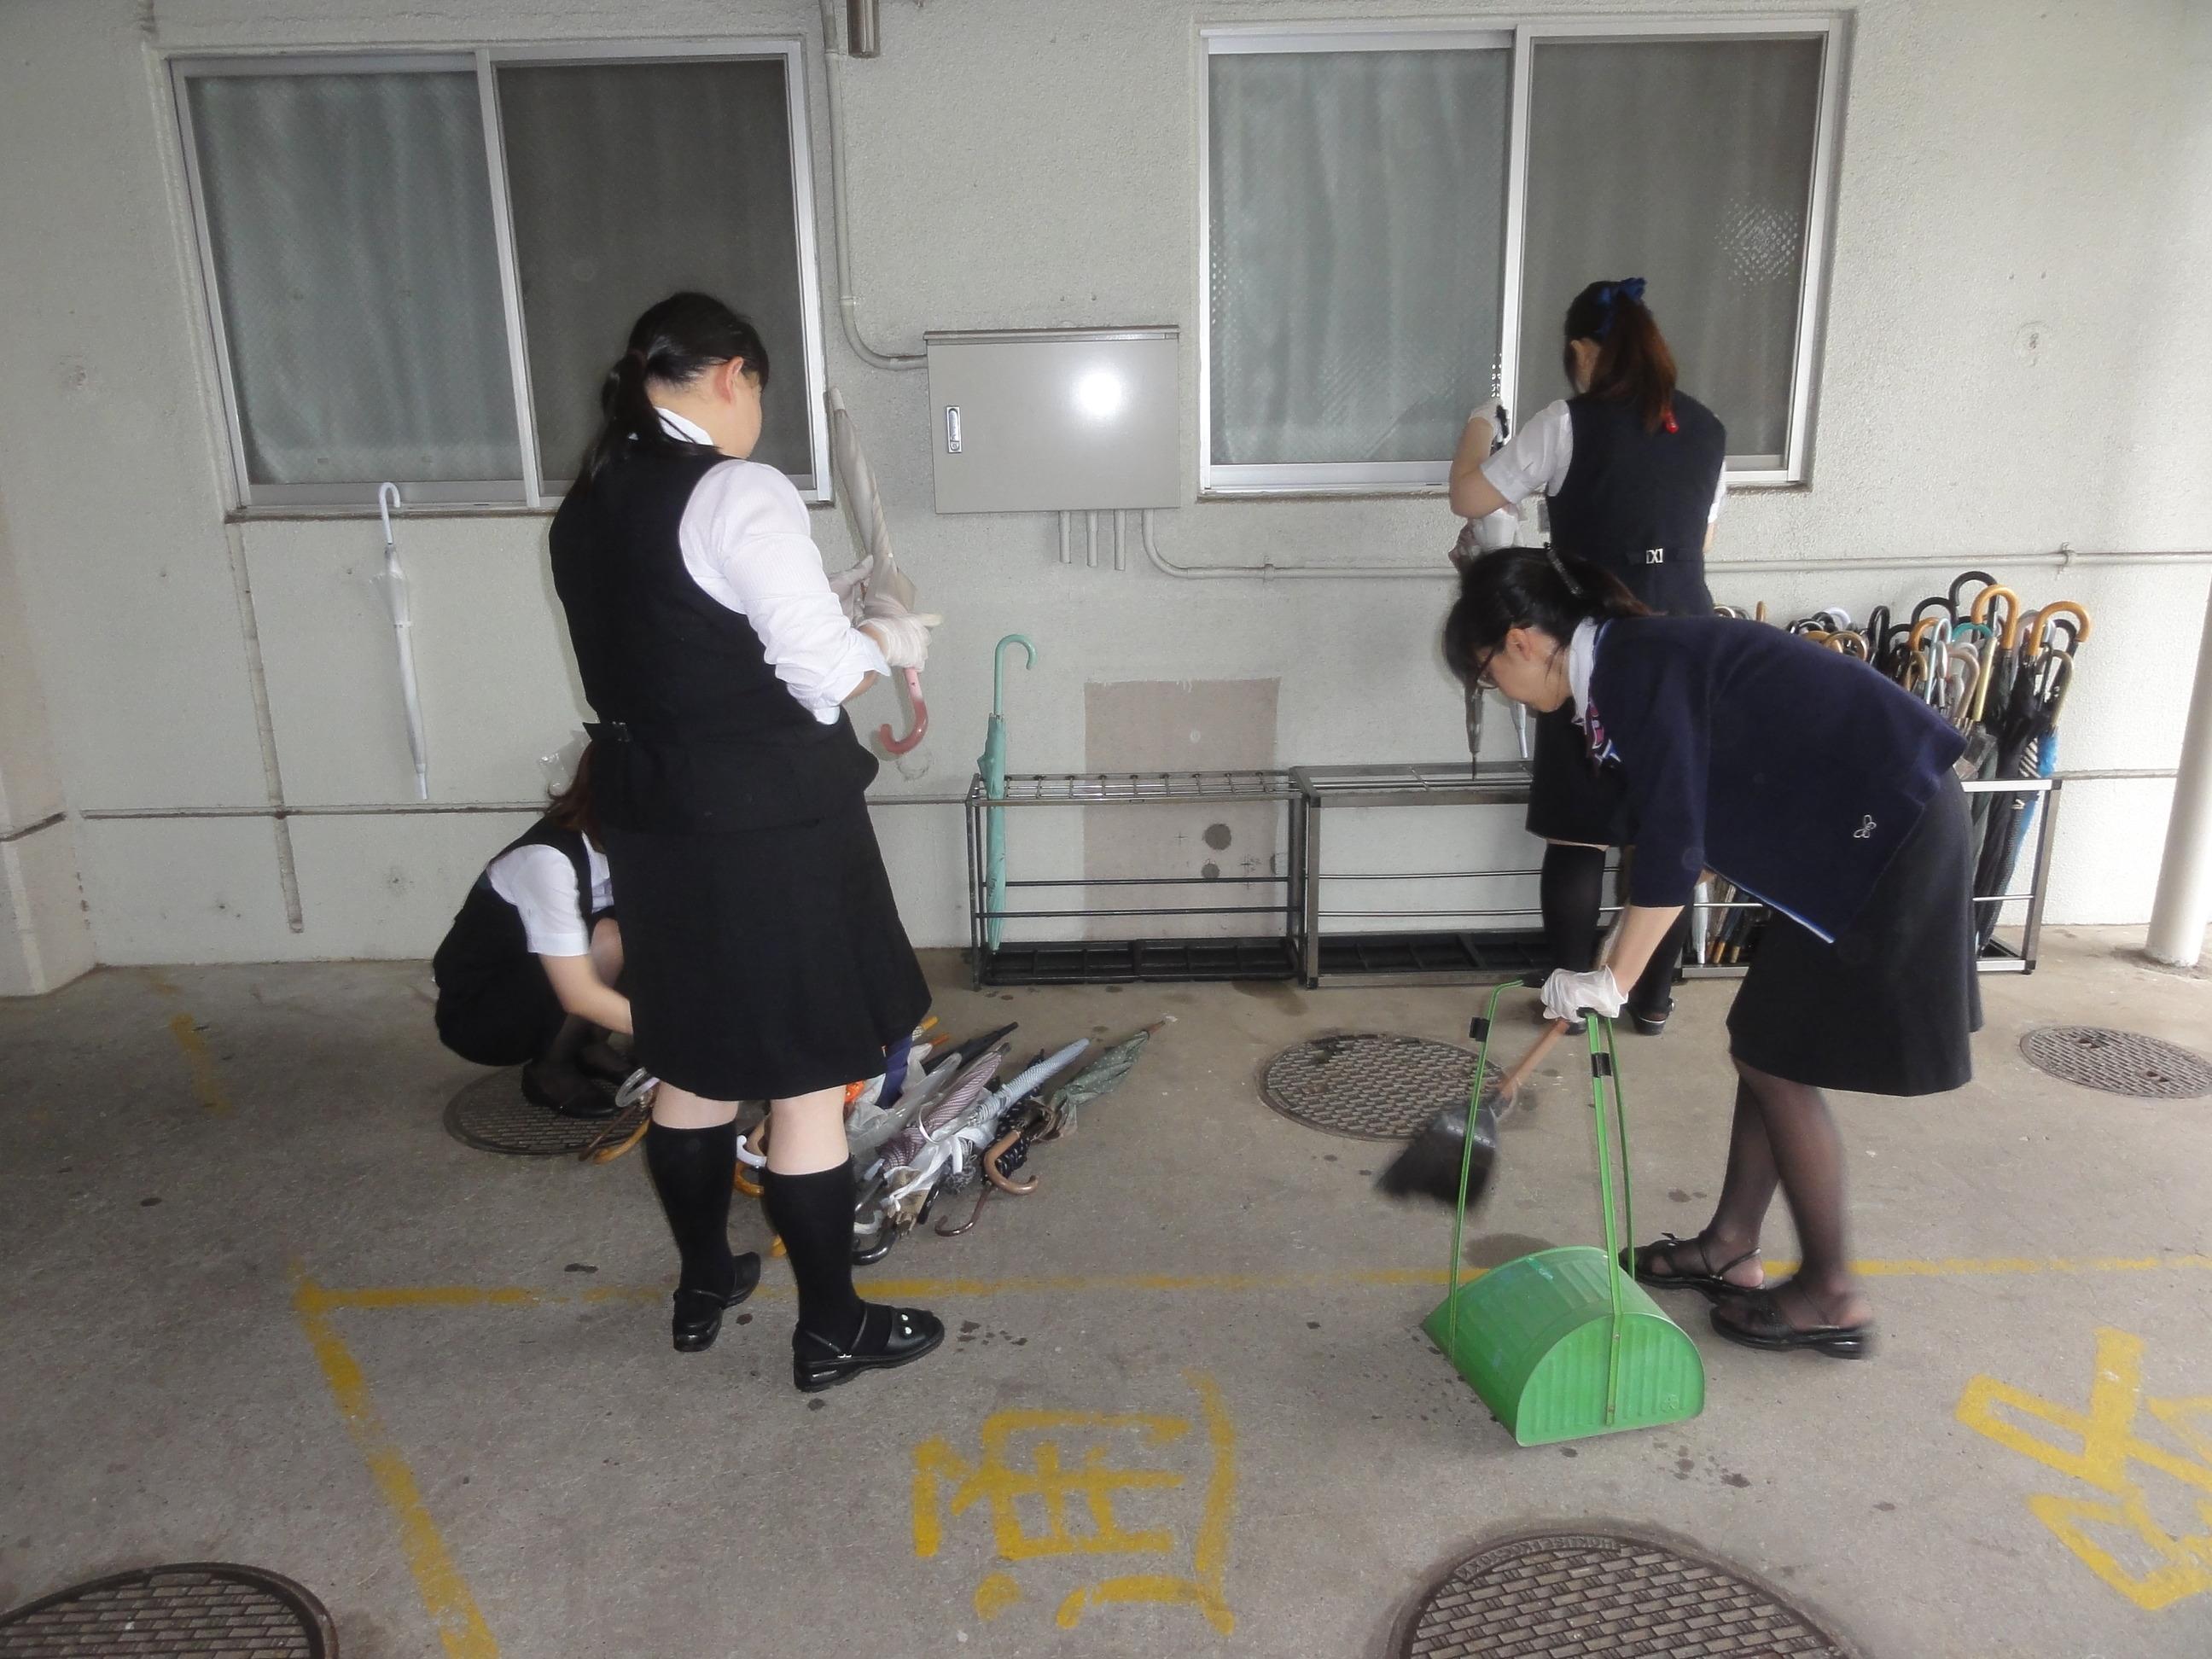 尚寿会 activity